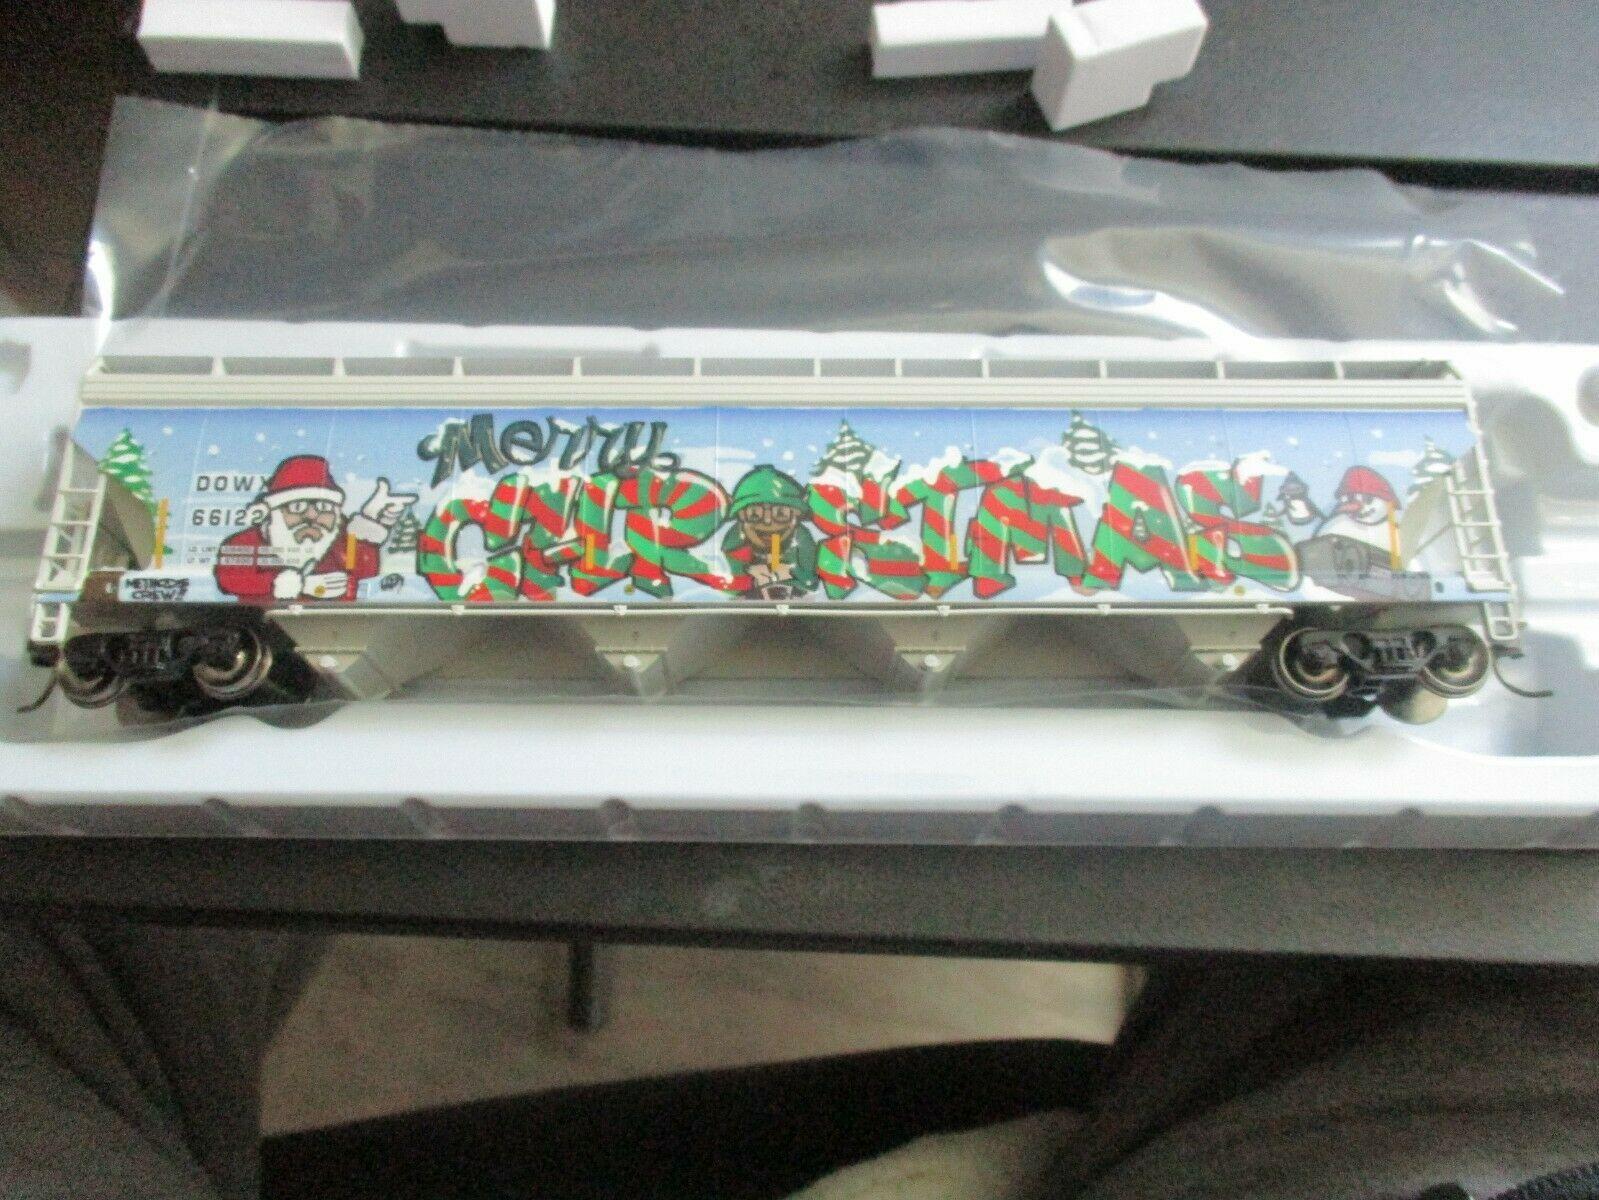 Atlas # 20006330 (Christmas Graffiti) 5800 Plastics Hopper DOWX 66122 HO-Scale